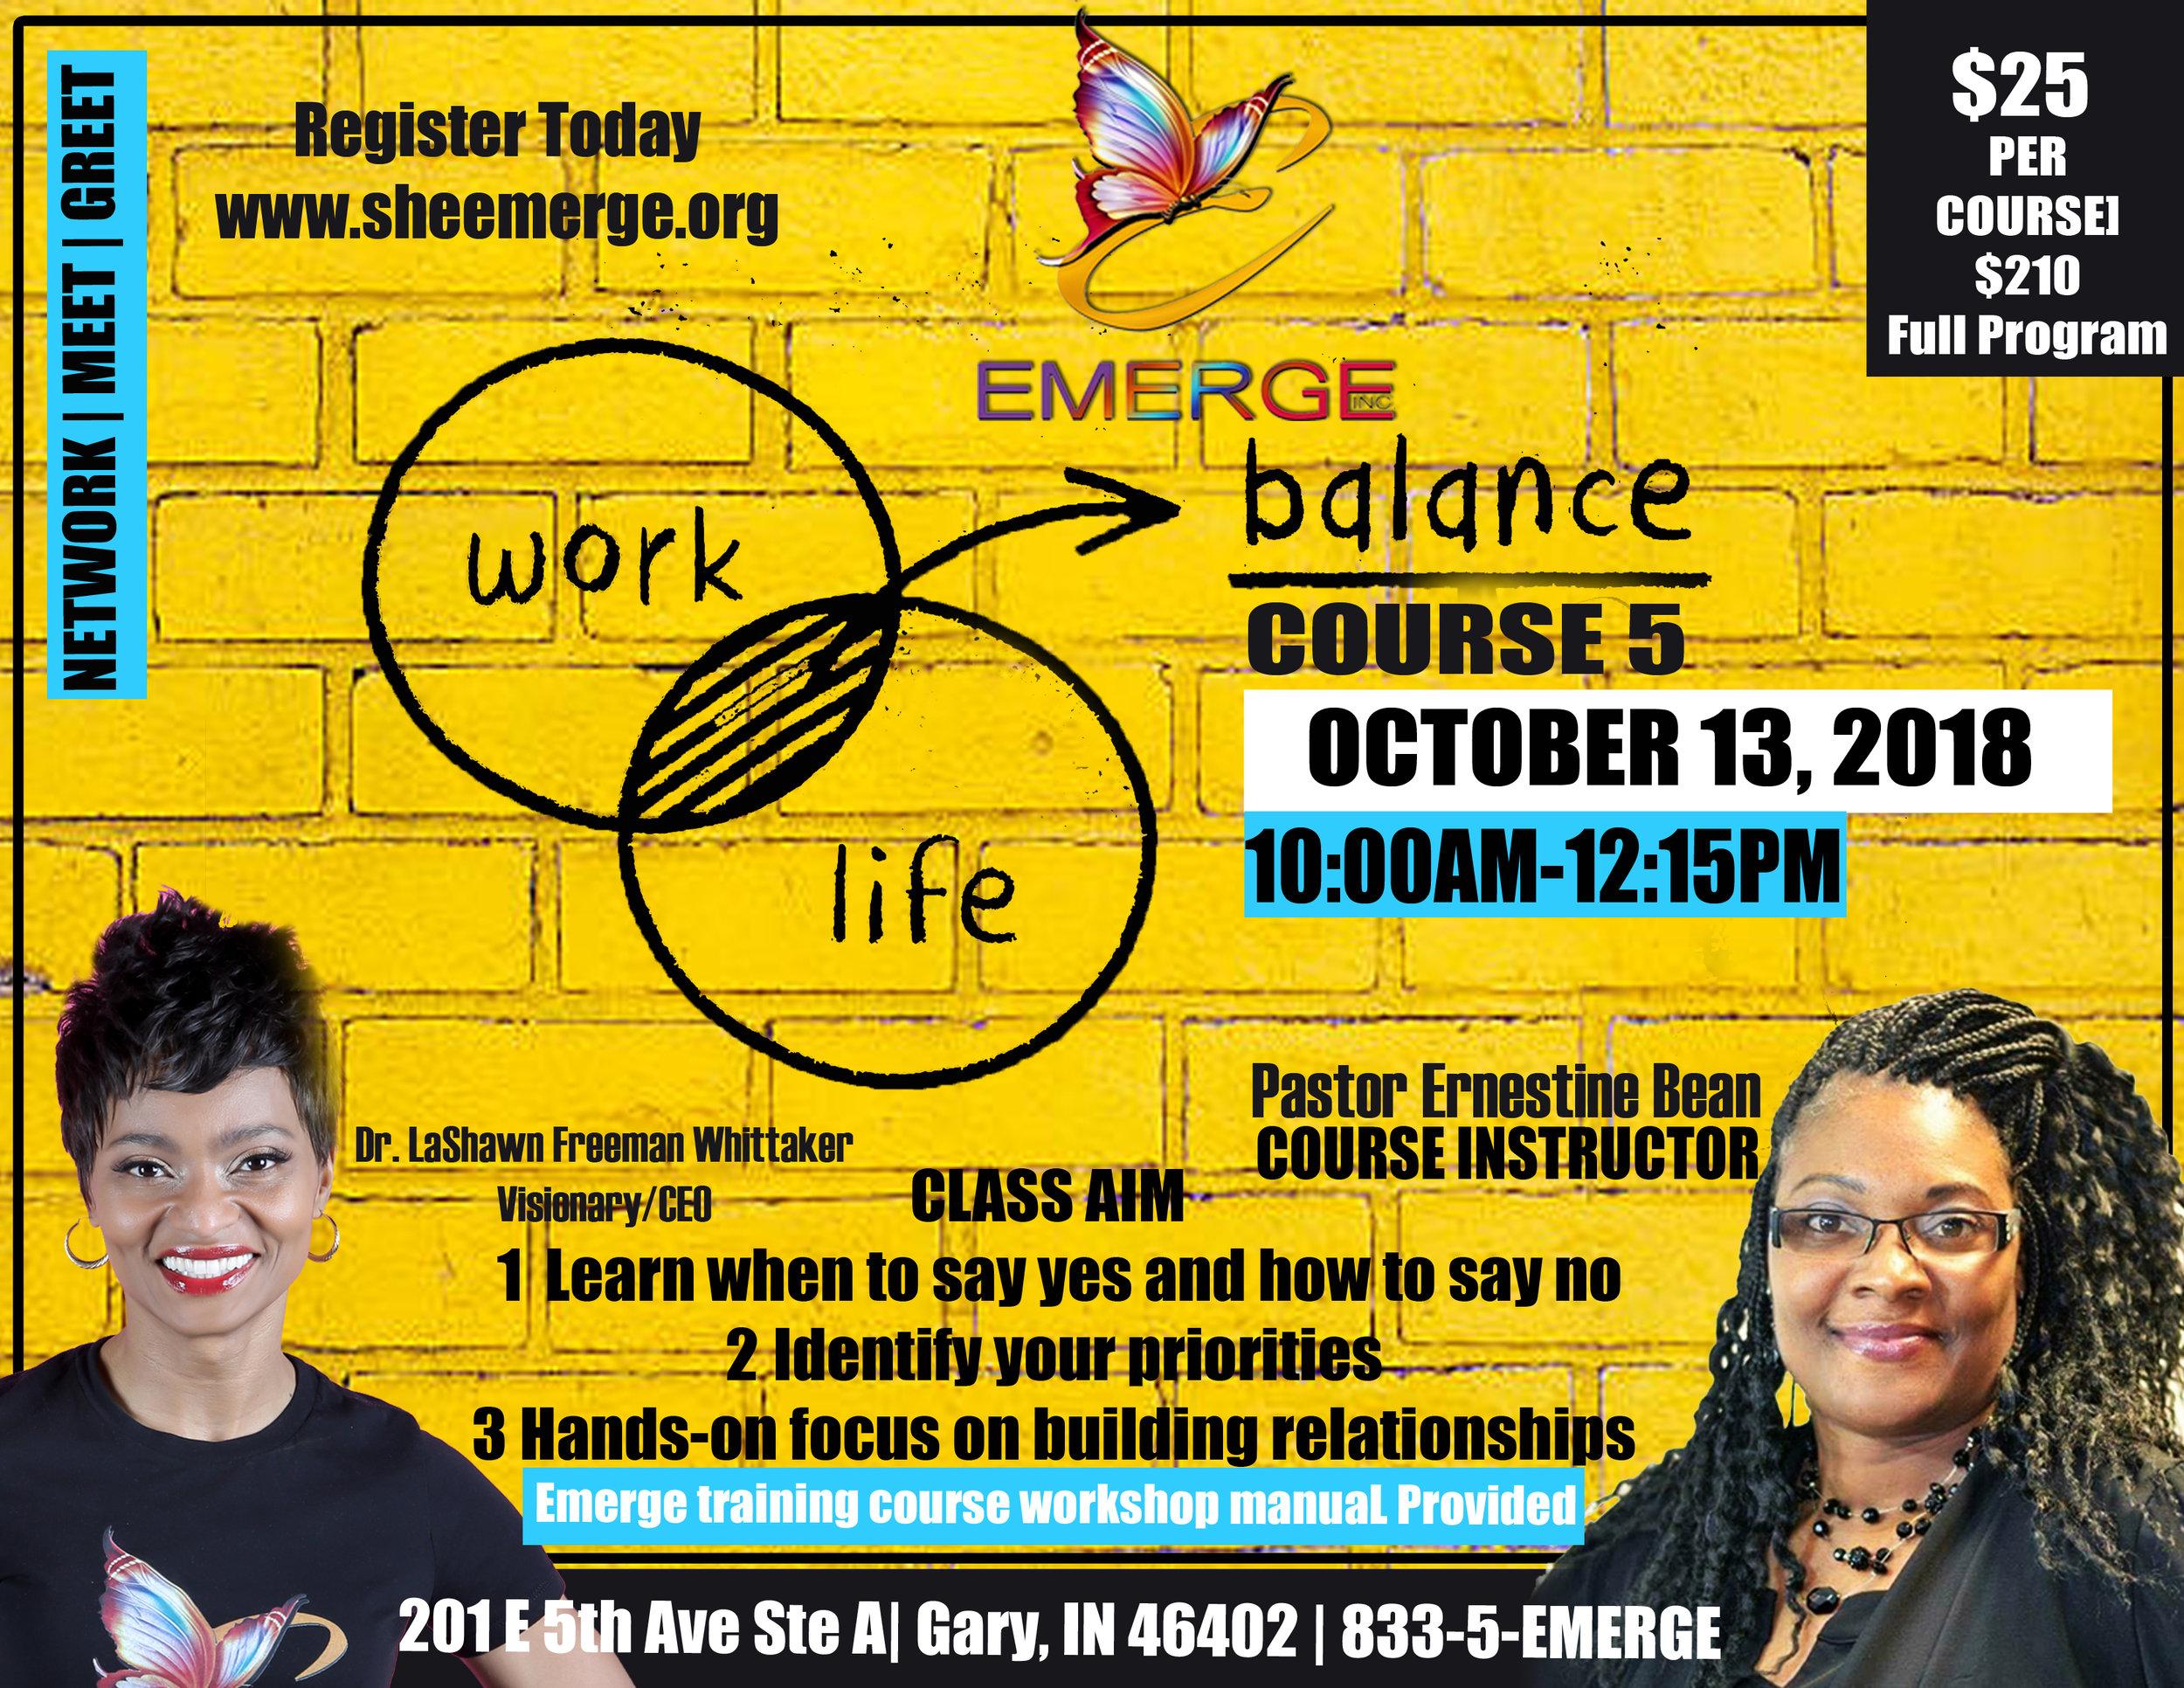 Course 5: Balance - Session Start Date: October 13, 2018Course Description: A Balanced Performance of everyday lifePresenter: Pastor Ernestine BeanLocation: 201 E 5th Ave Ste DTime: 10:00am-12:15pm